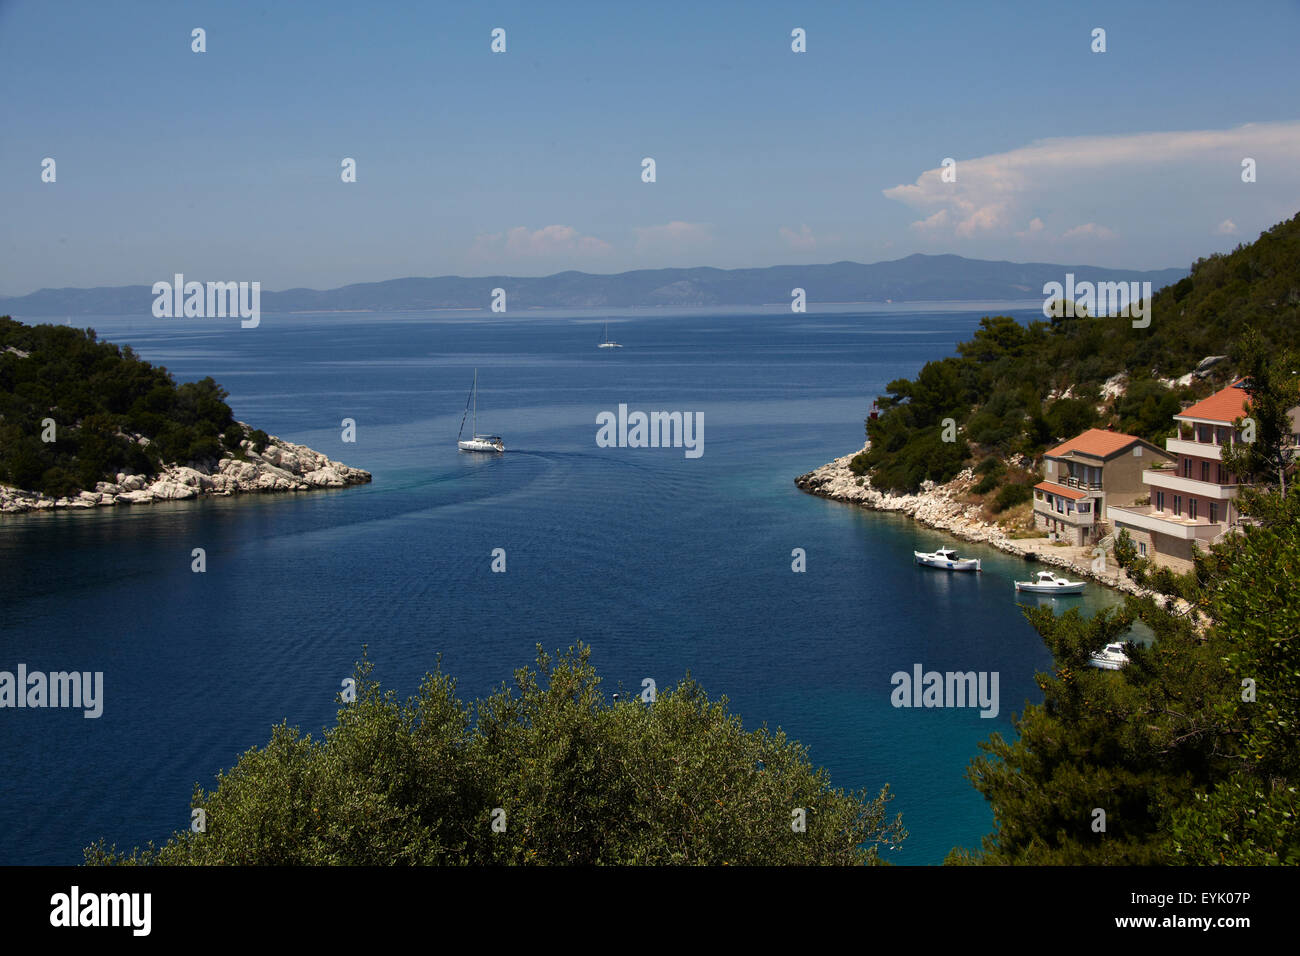 Europa, Kroatien, Dalmacia Provinz, Insel Lastovo, Adria, Zaklopatica Bucht, Stockbild